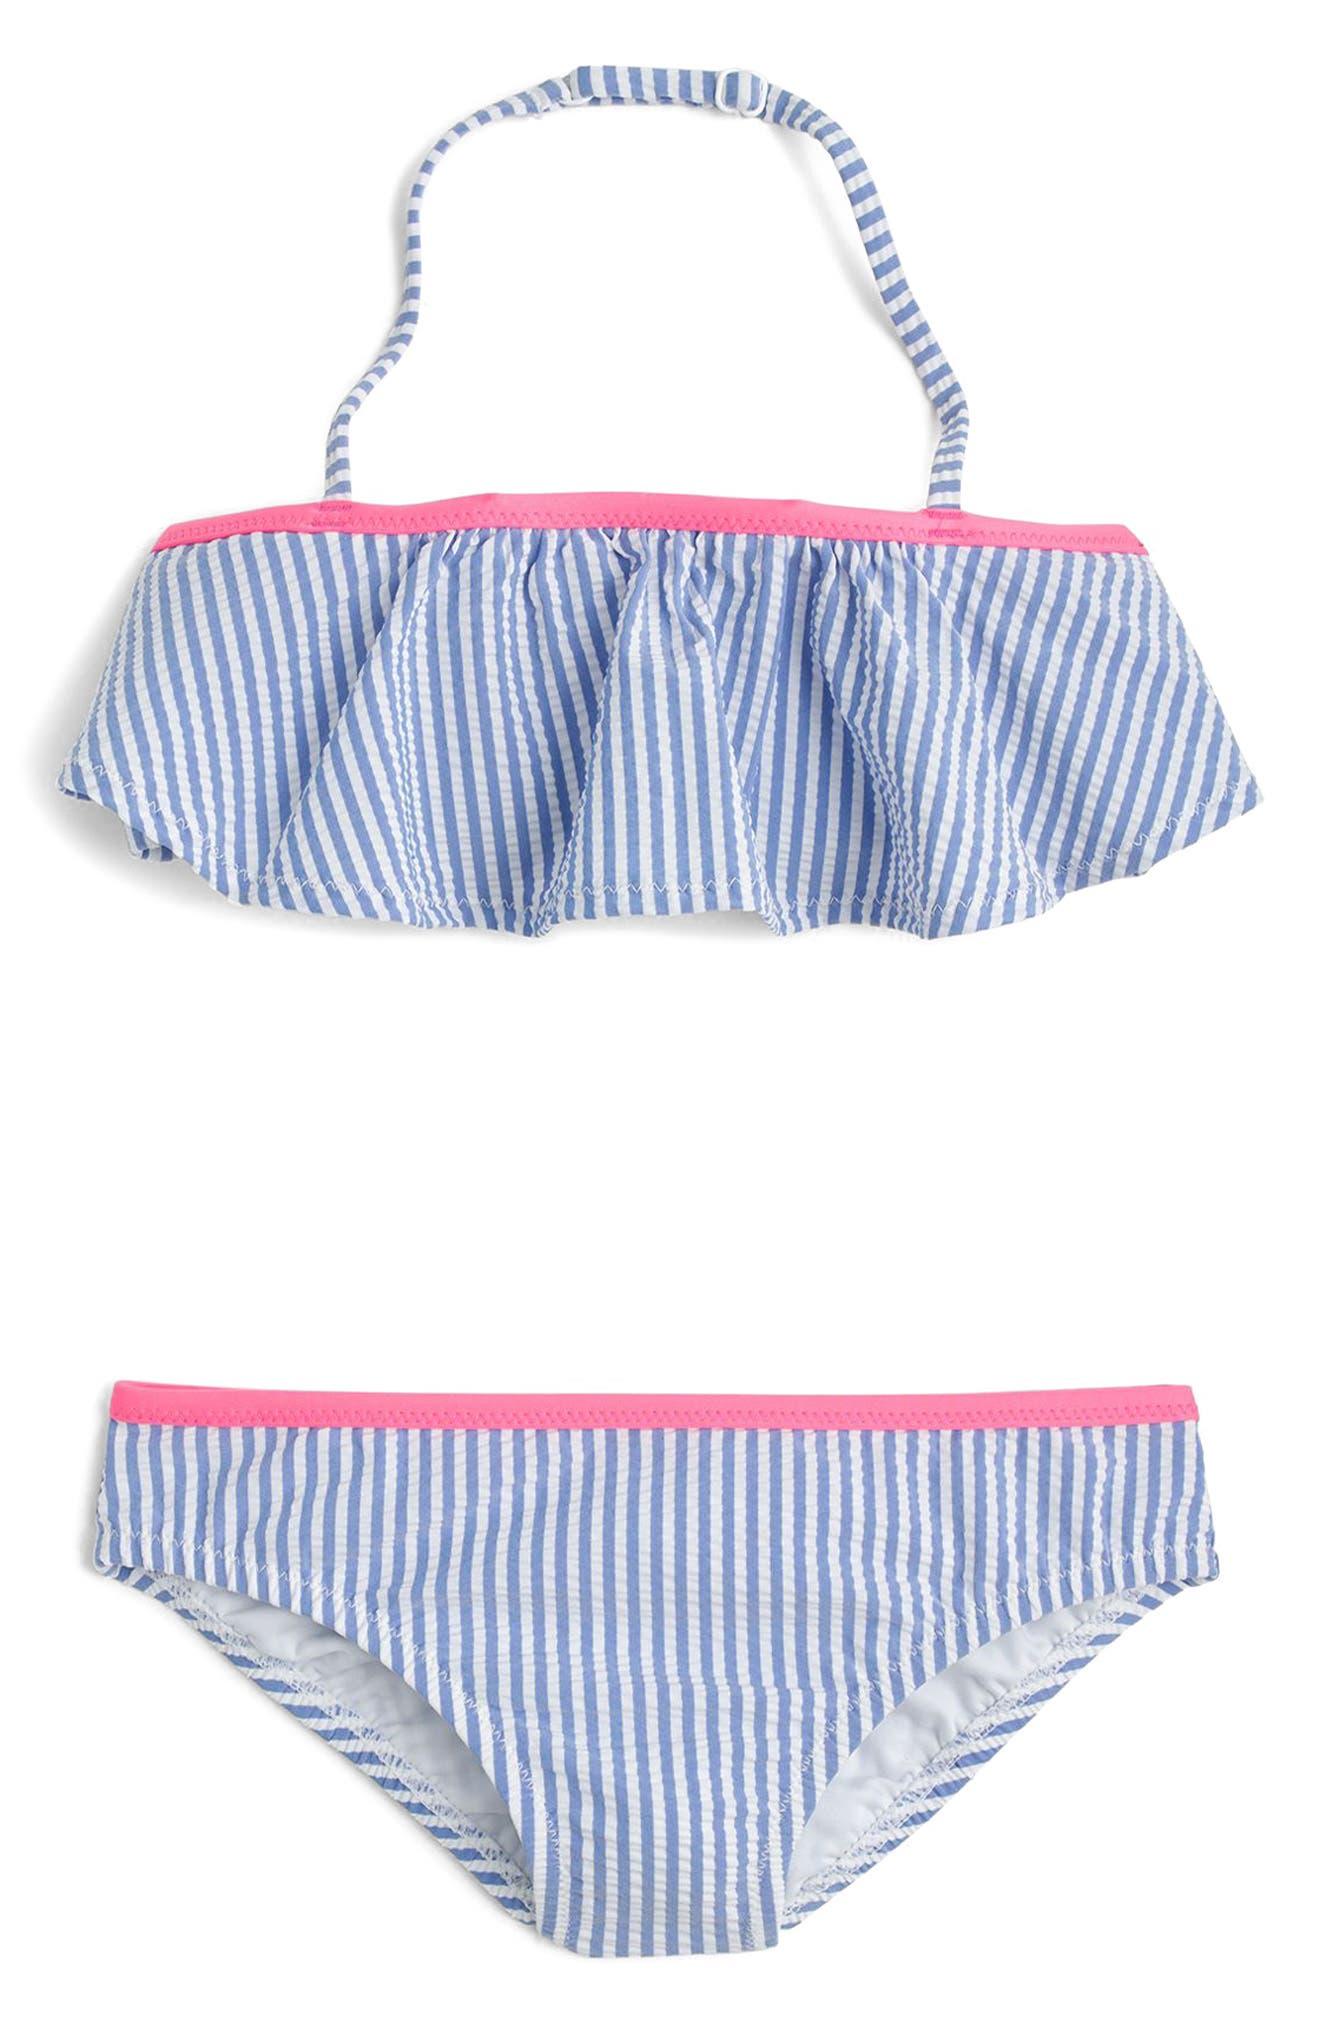 Ruffled Seersucker Two-Piece Bikini Swimsuit,                         Main,                         color, Blue Pink Multi